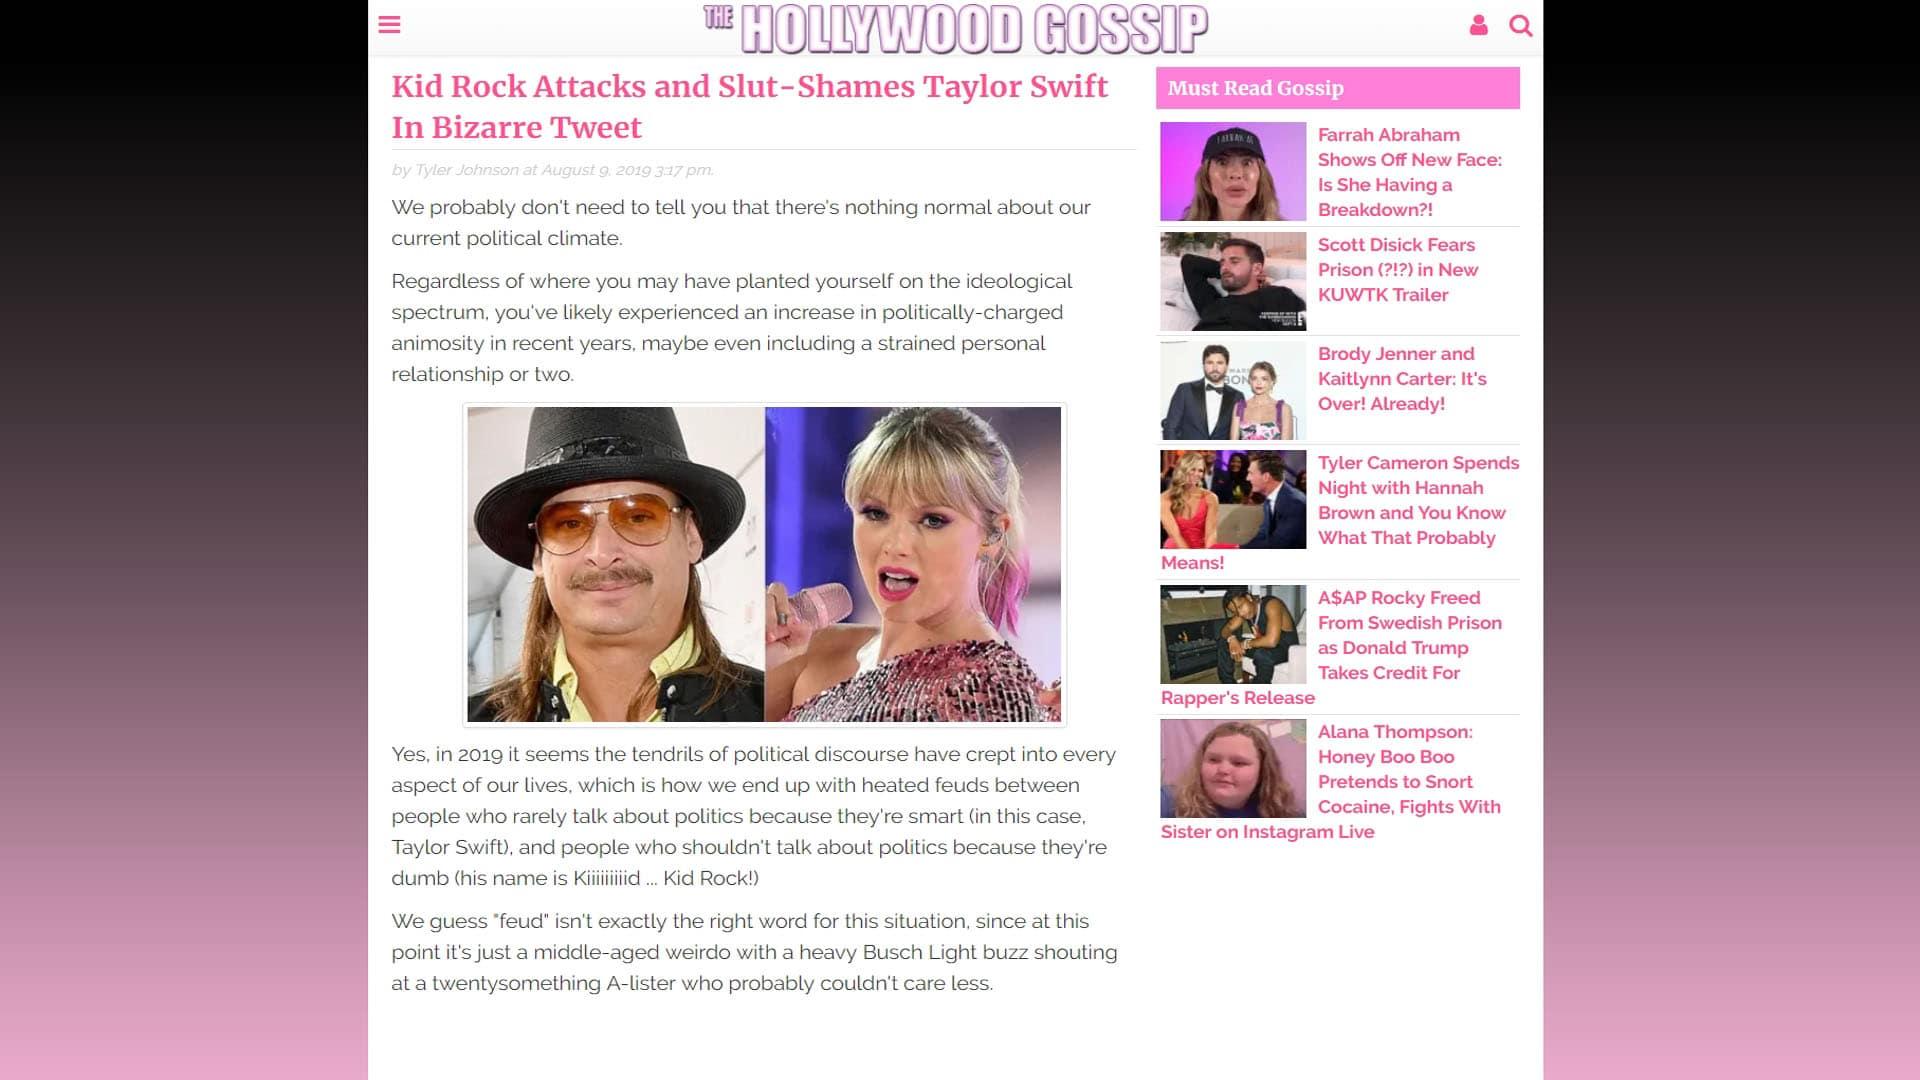 TheHollywoodGossip Kid Rock Attacks And Slut-Shames Taylor Swift In Bizarre Tweet